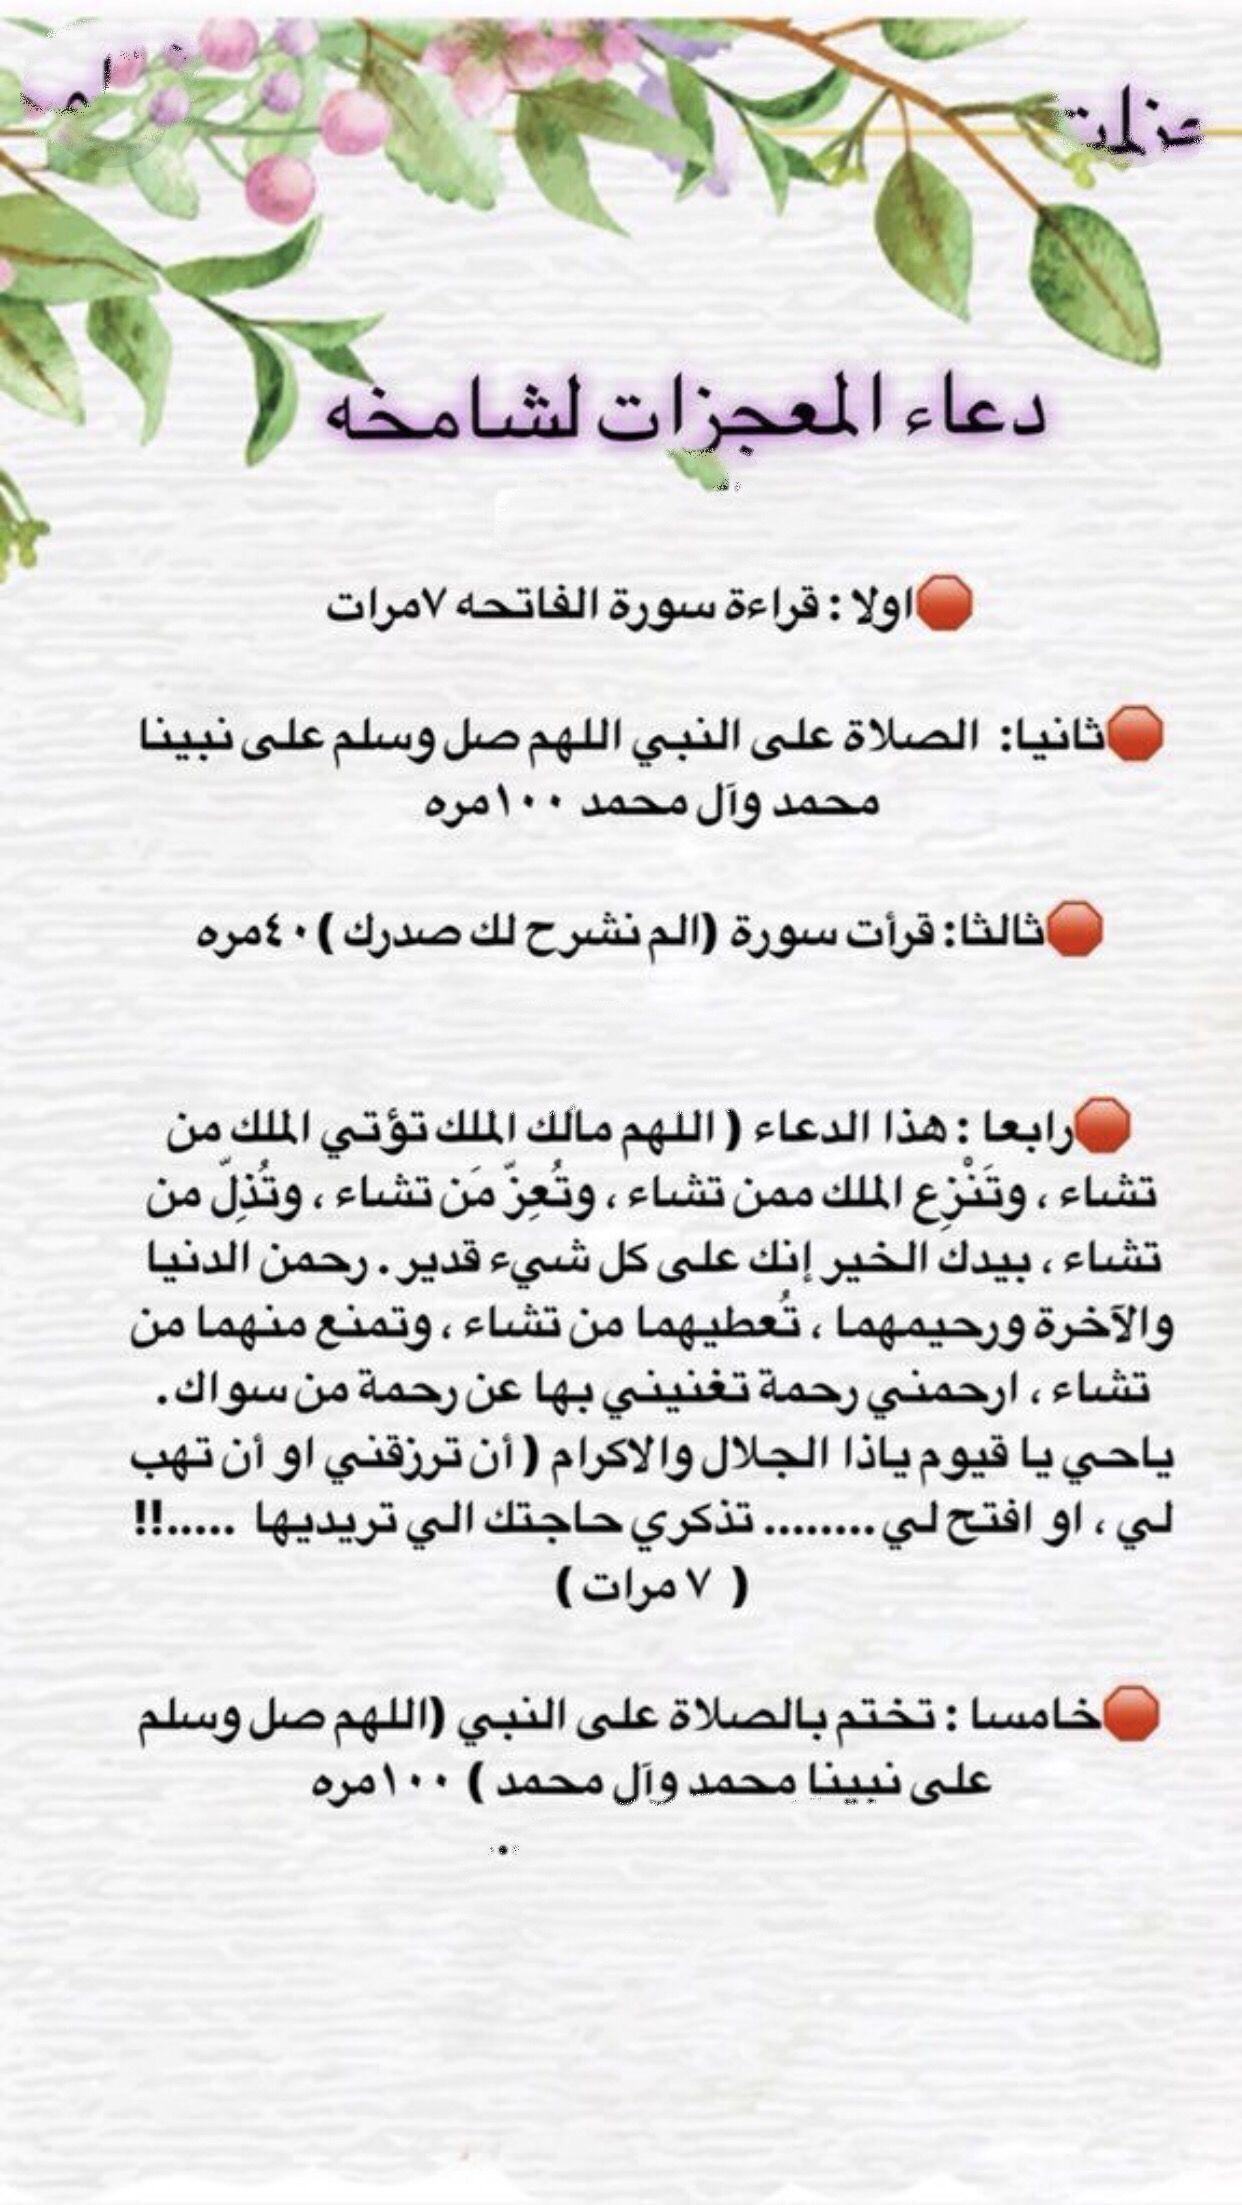 Epingle Par Farida Sur أدعية Coran Recitation Du Coran Vie Motivation